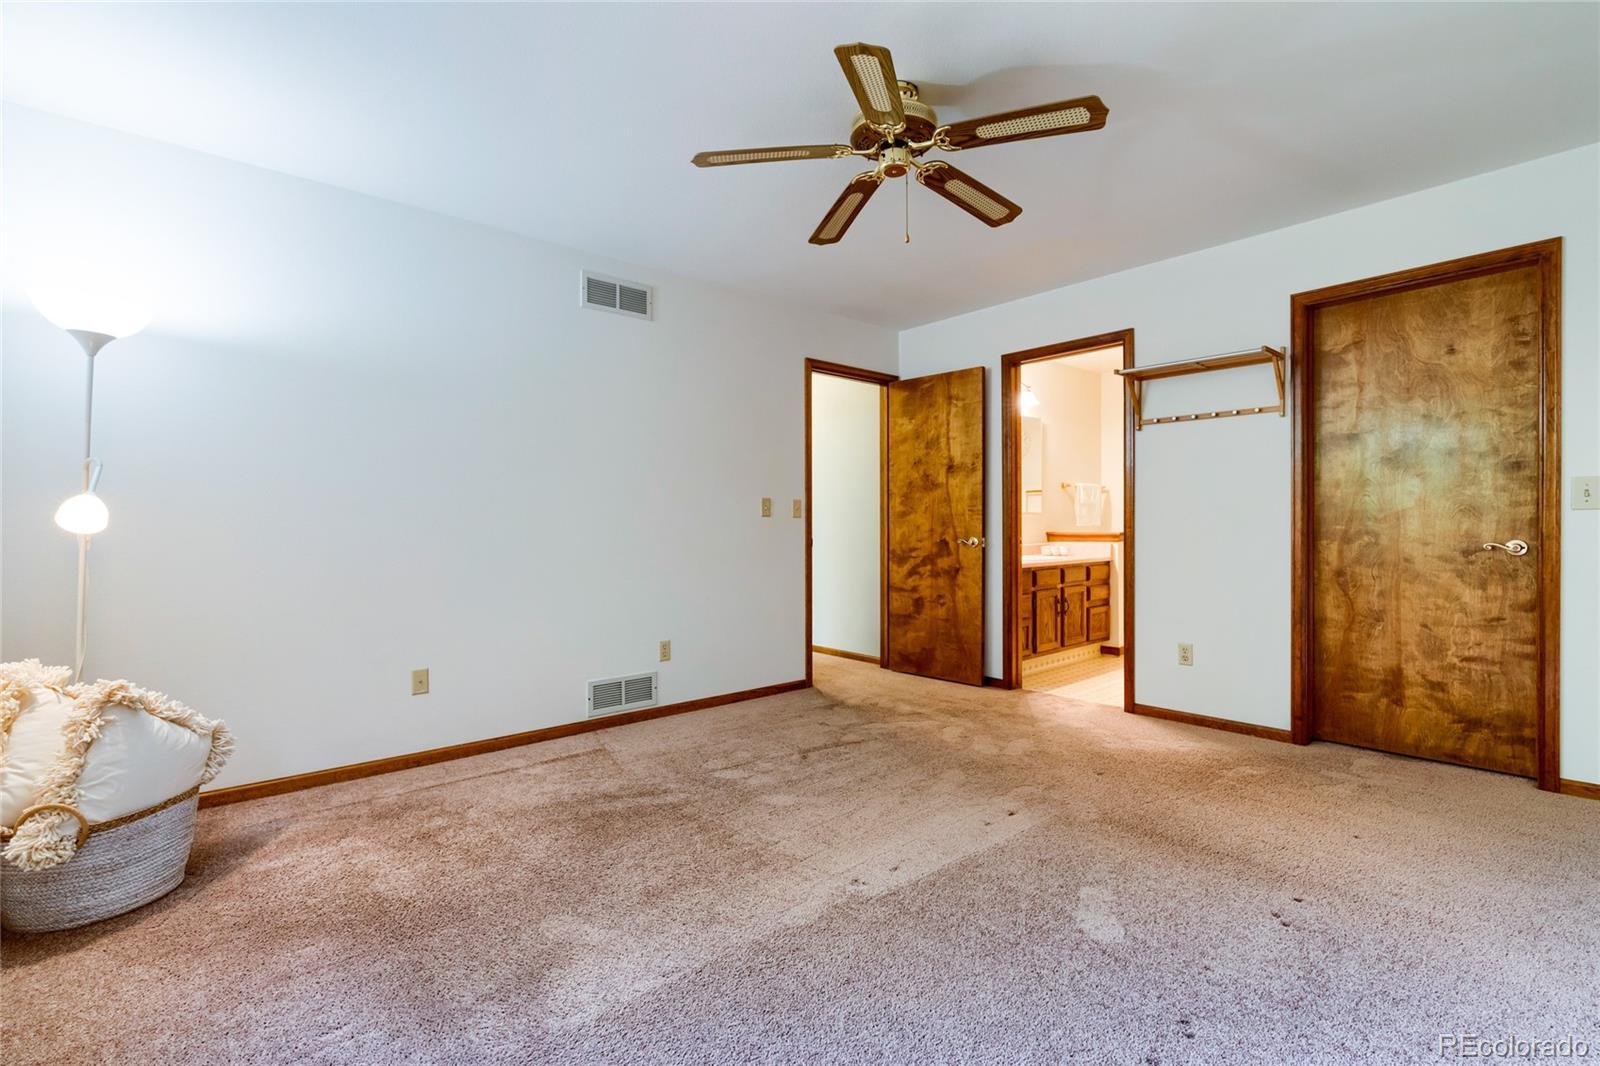 MLS# 6009976 - 8 - 720 Arbor Avenue #16, Fort Collins, CO 80526